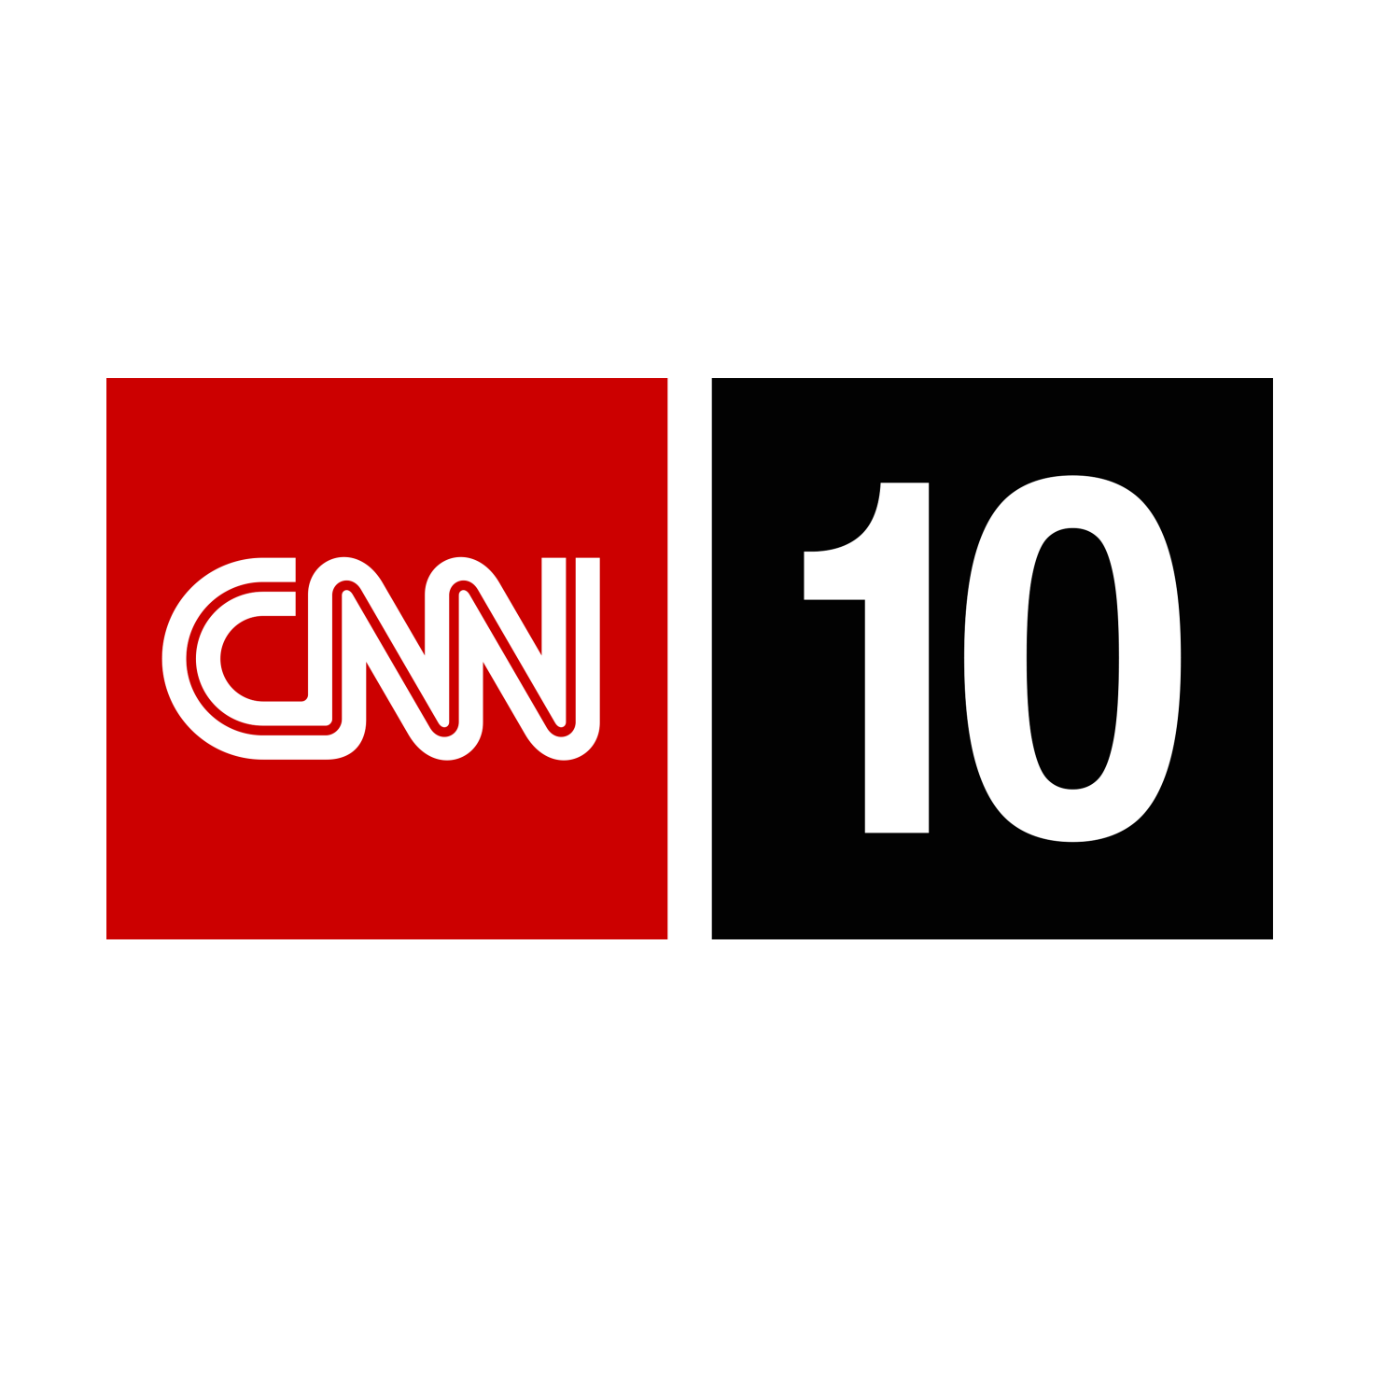 Cnn Current News: CNN 10 (video) (podcast